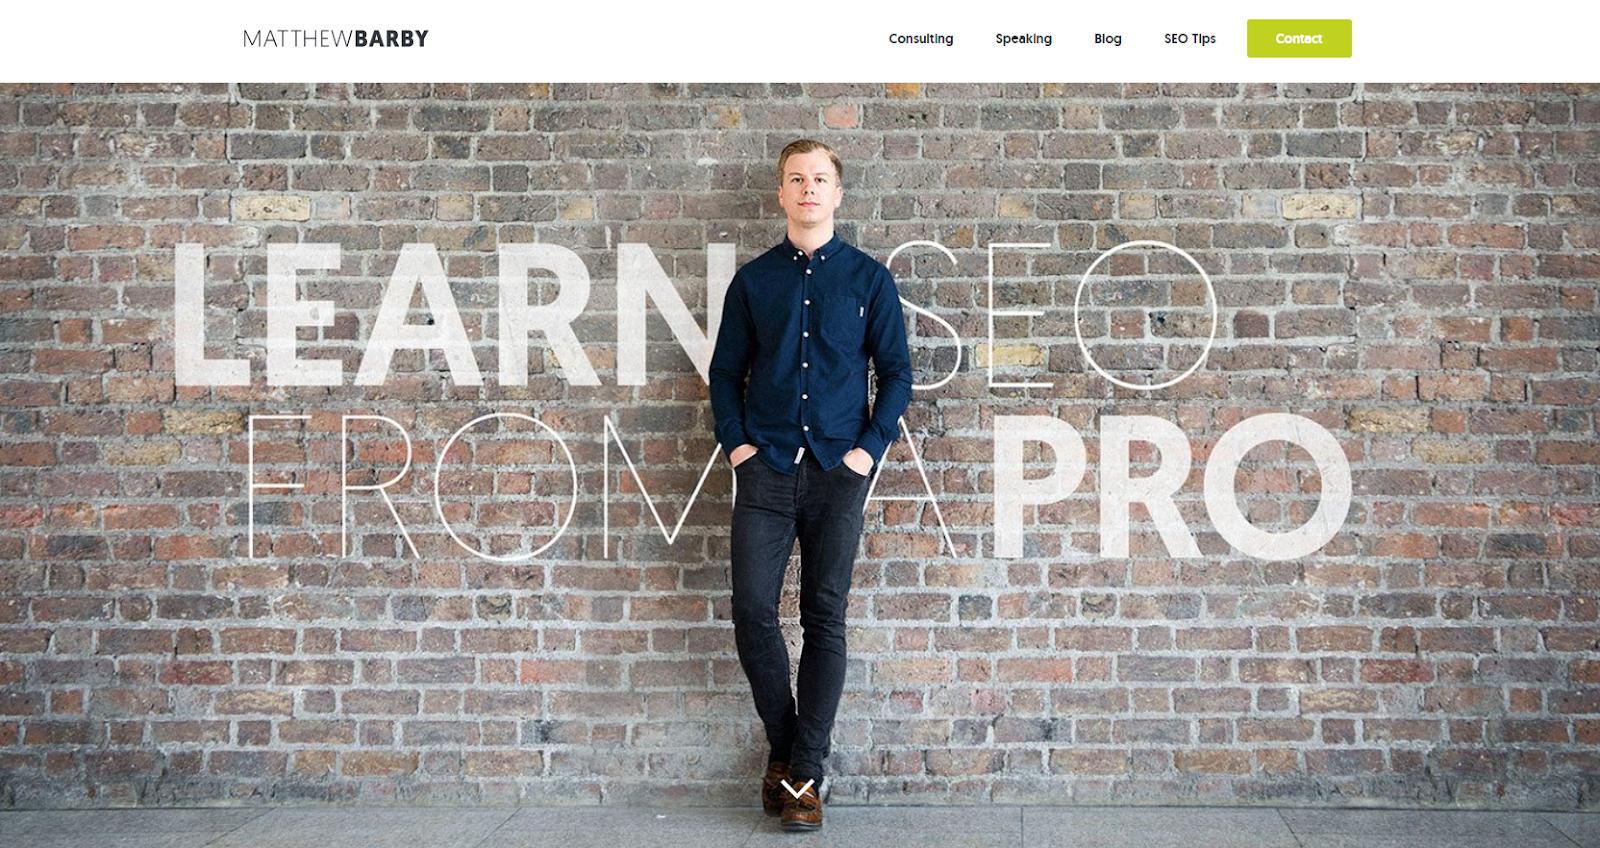 Matthew Barby's personal website